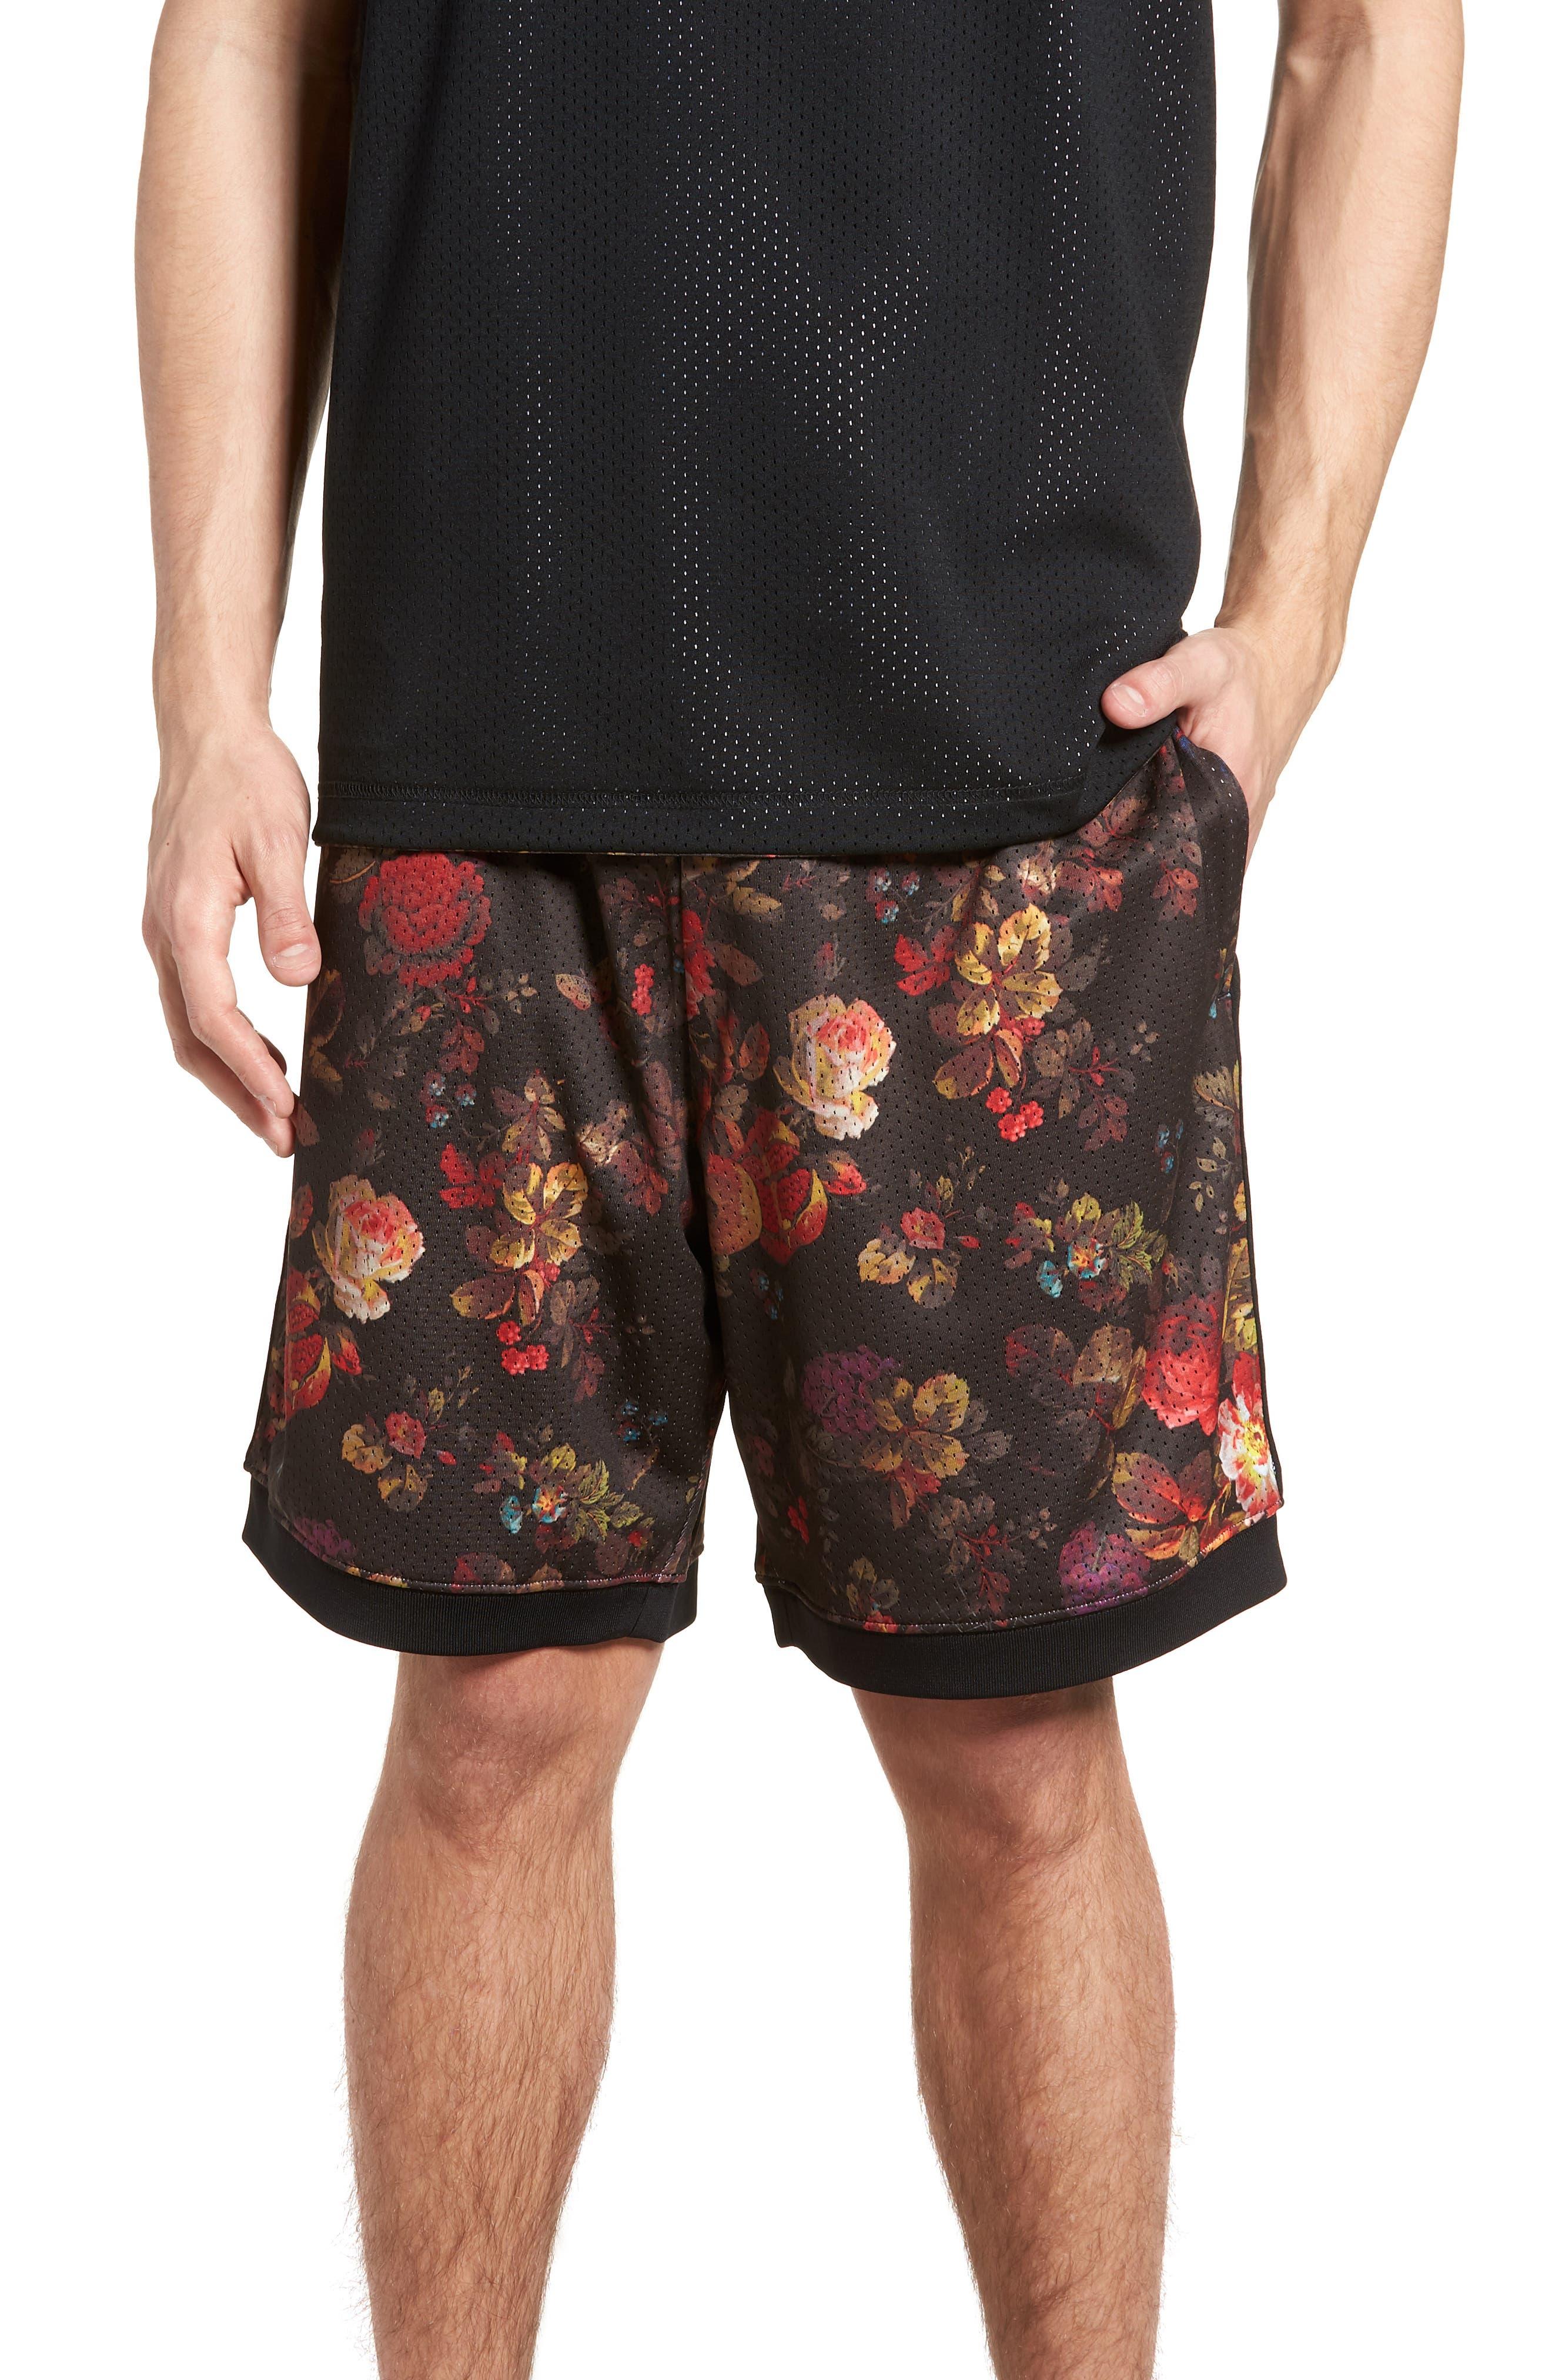 Dry Floral Shorts,                             Main thumbnail 1, color,                             BLACK/ WHITE